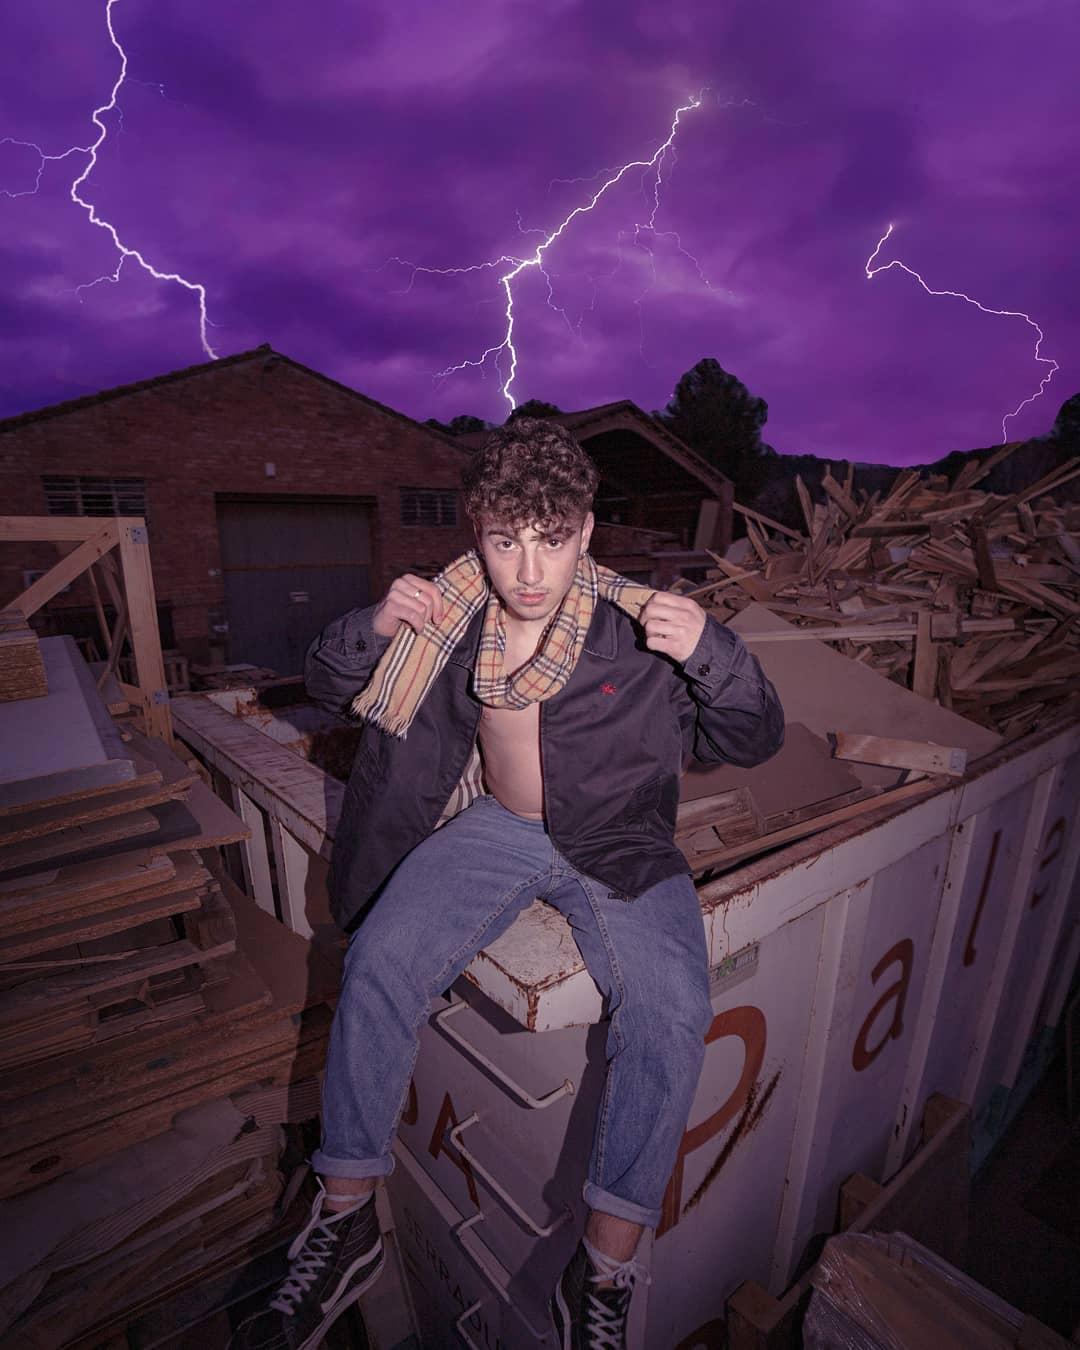 grunge canon 14mm mood vintage polo streetwear purple burberry edit lightning storm